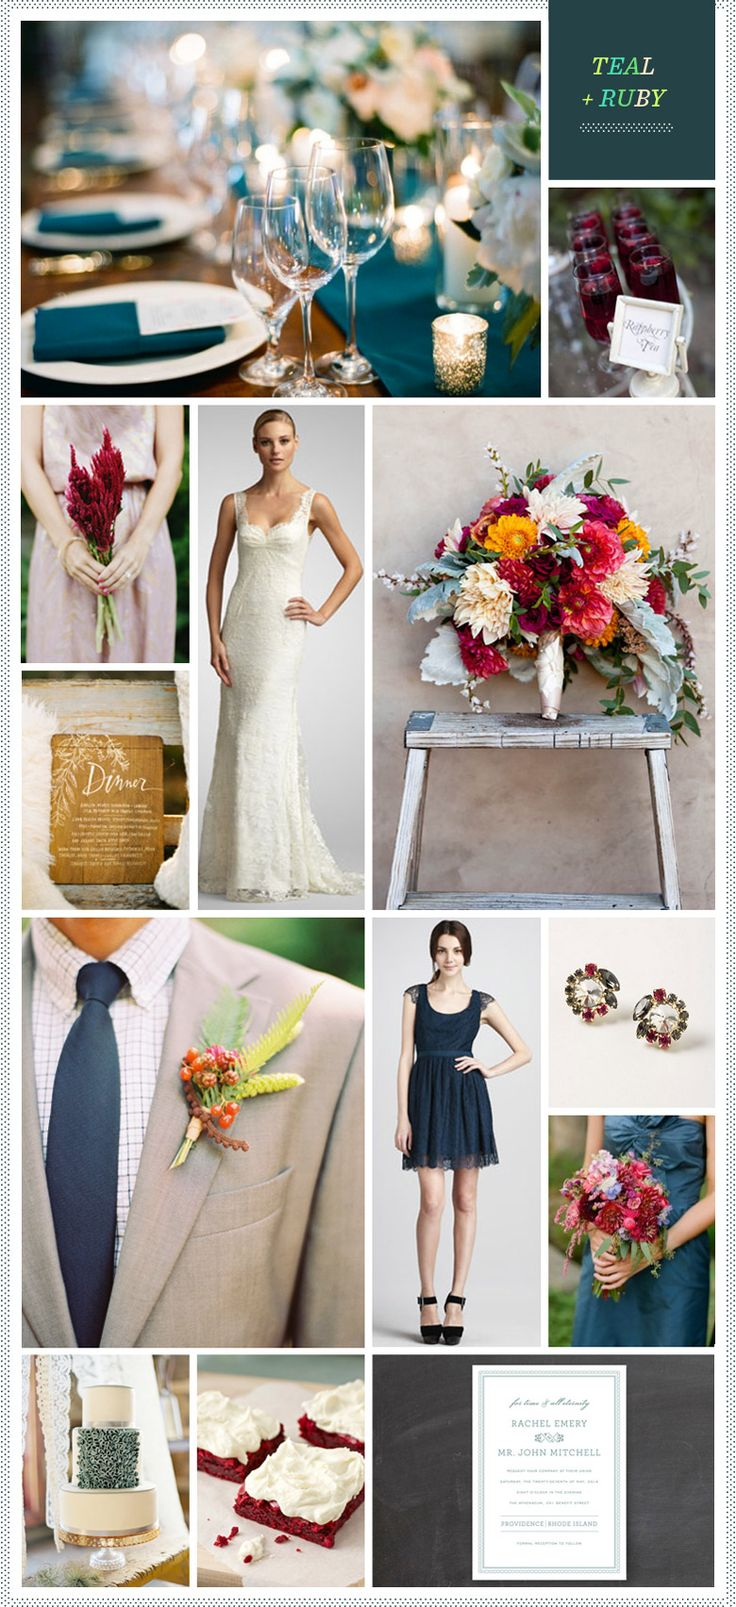 best wedding ideas images on pinterest wedding stuff dream